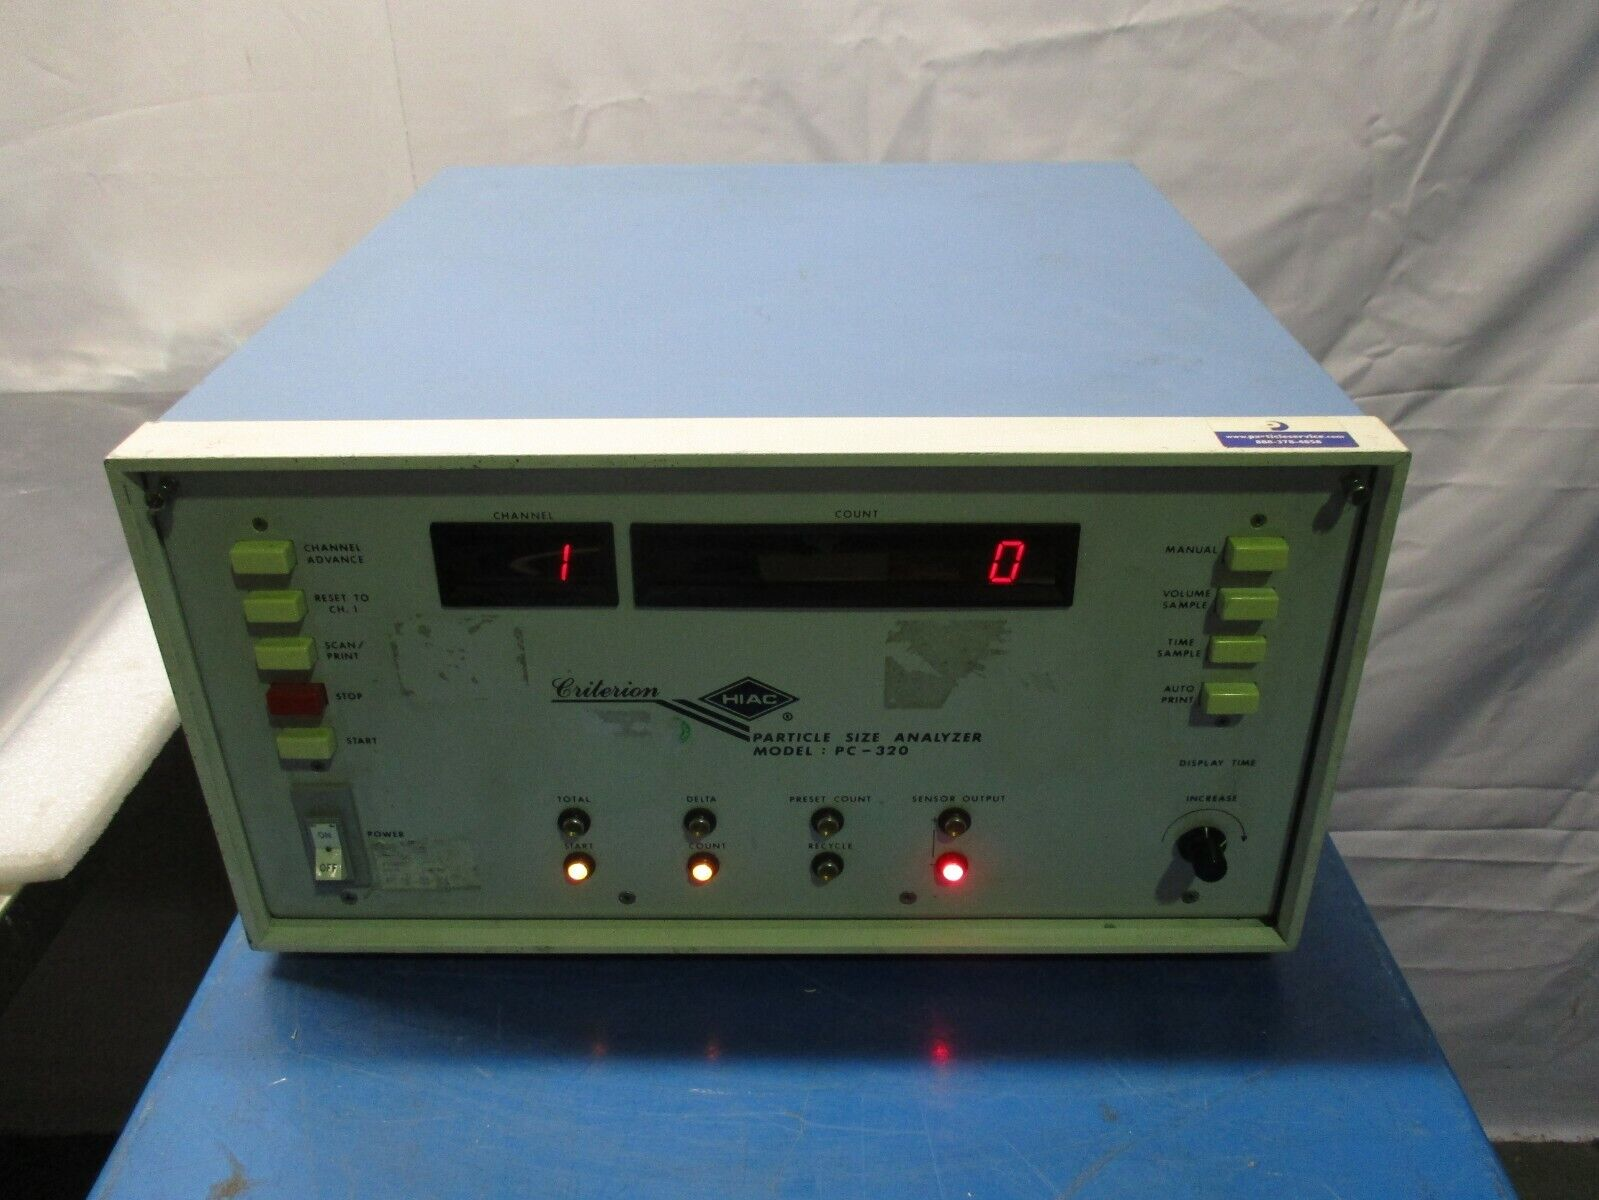 Criterion HIAC PC-320 Particle Size Analyzer, 453622